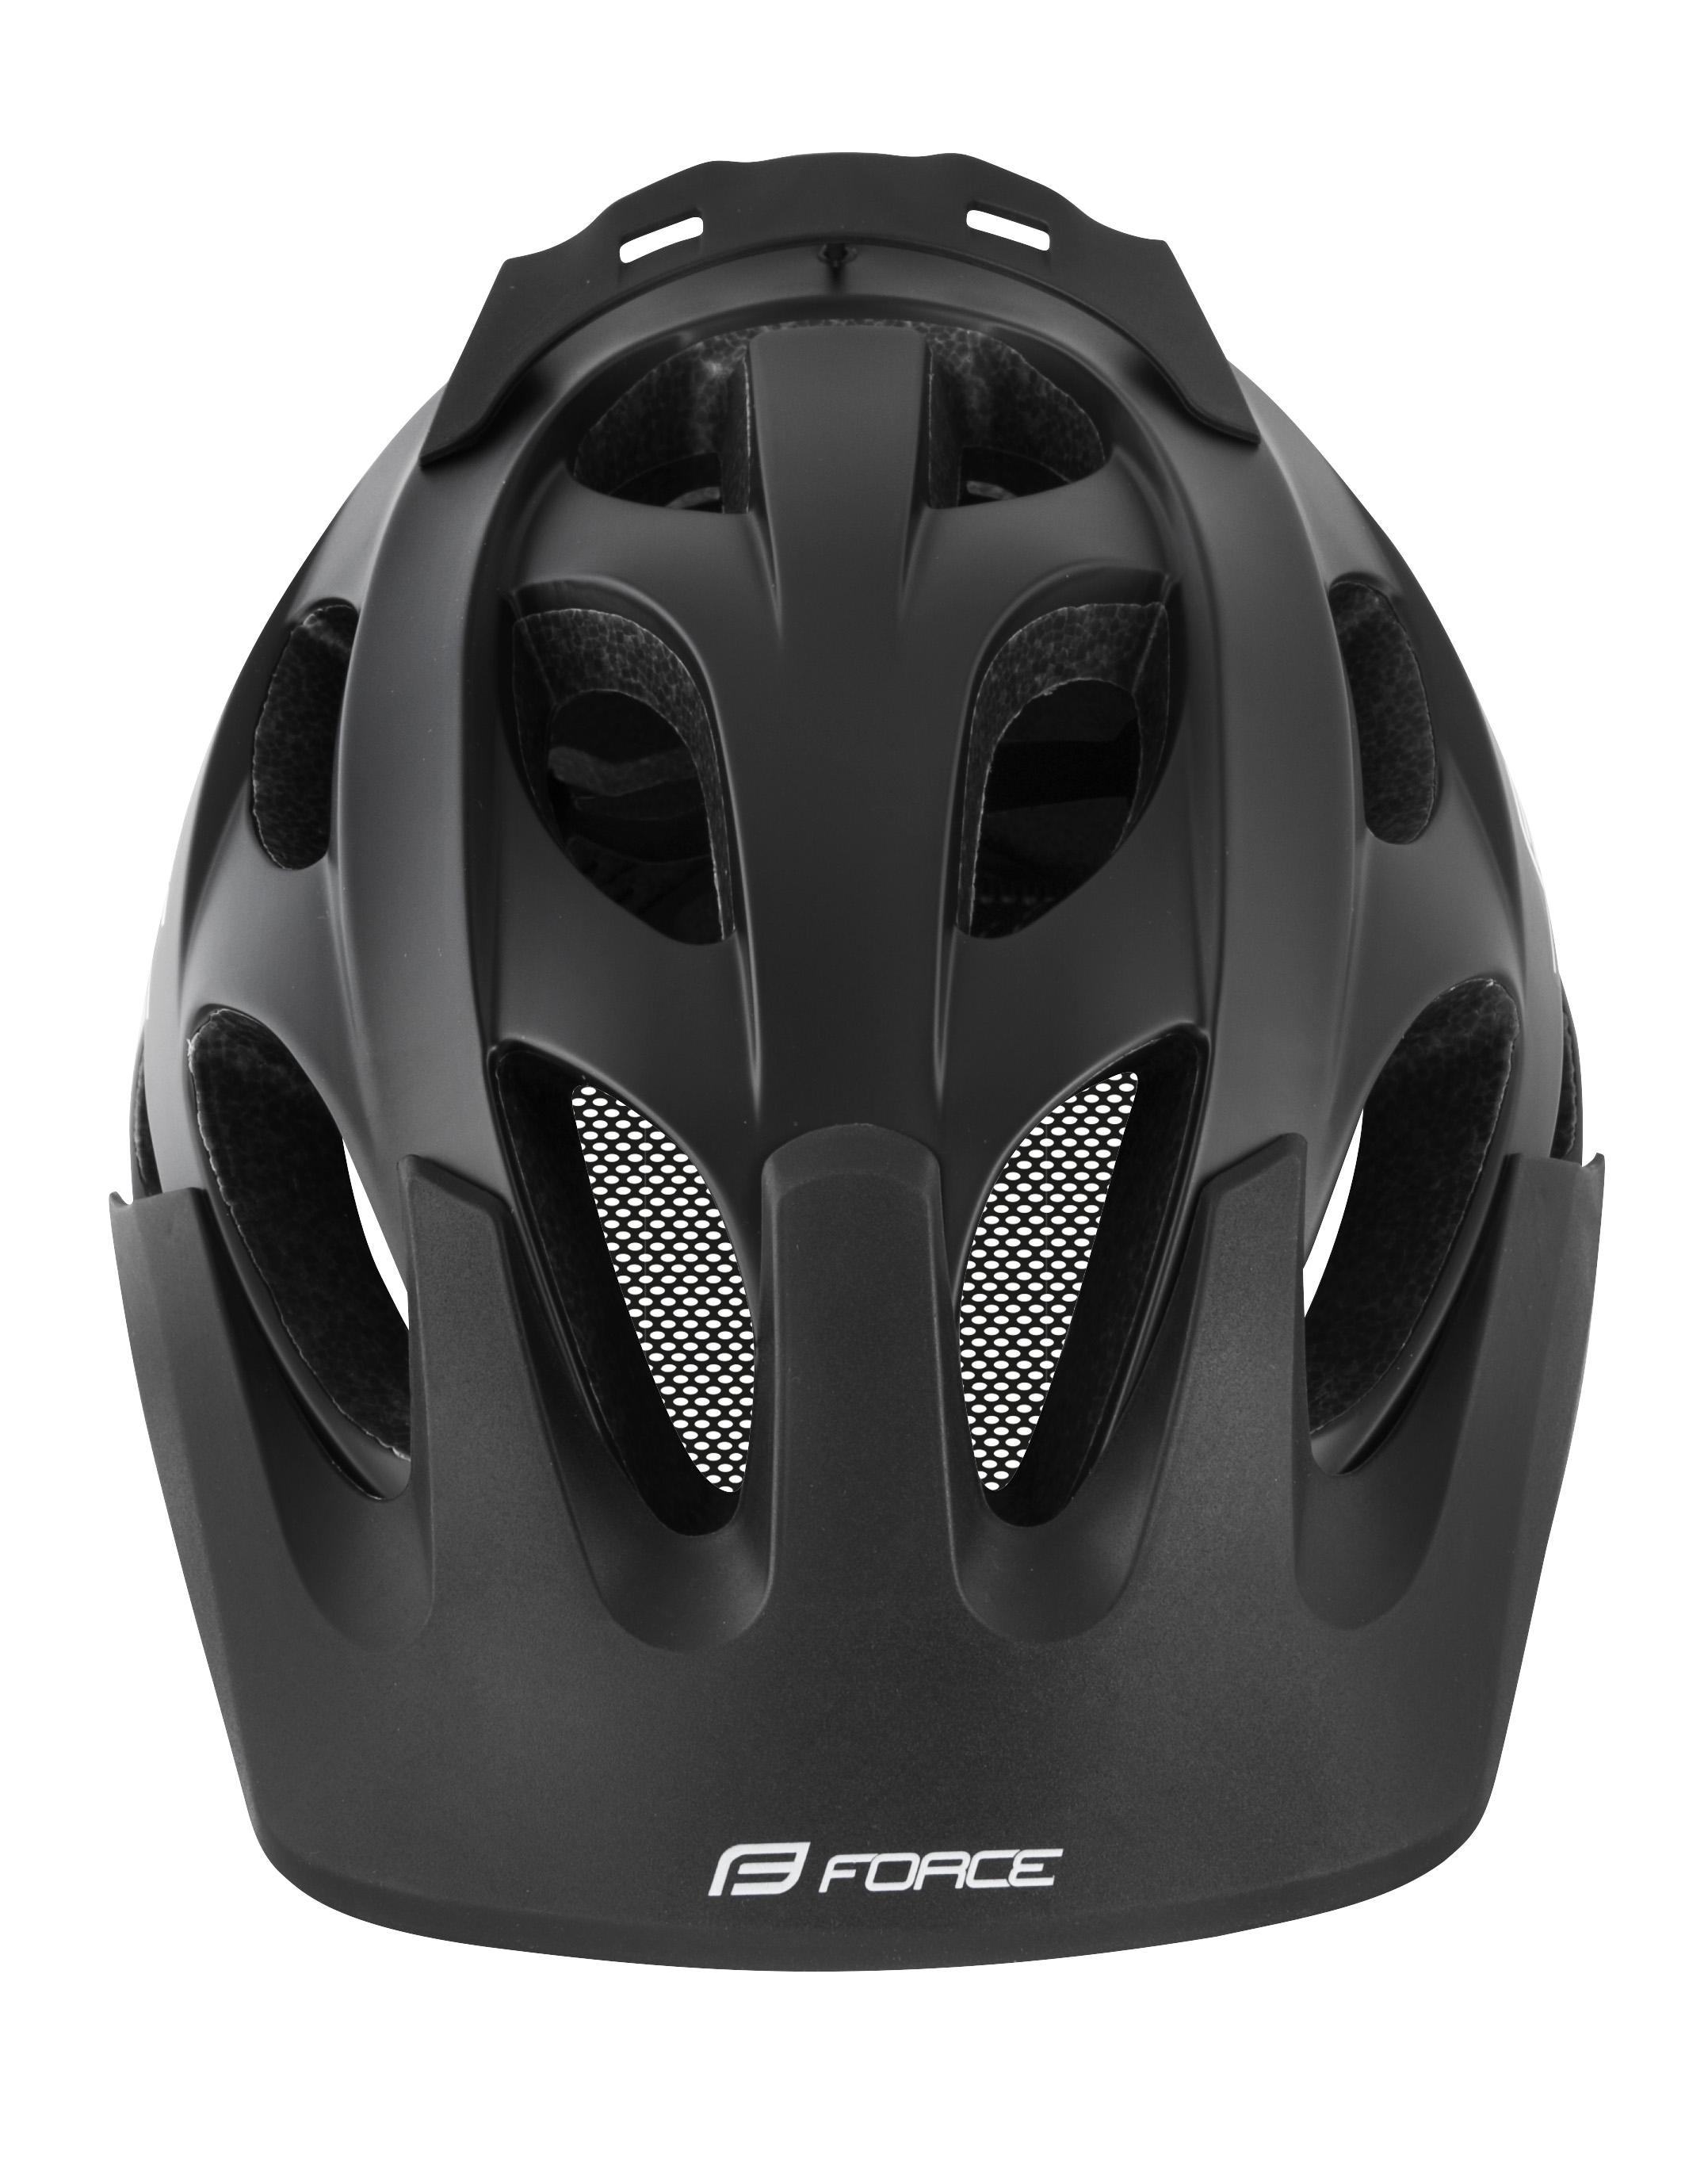 ec0be04f18 Cyklistická přilba FORCE RAPTOR MTB